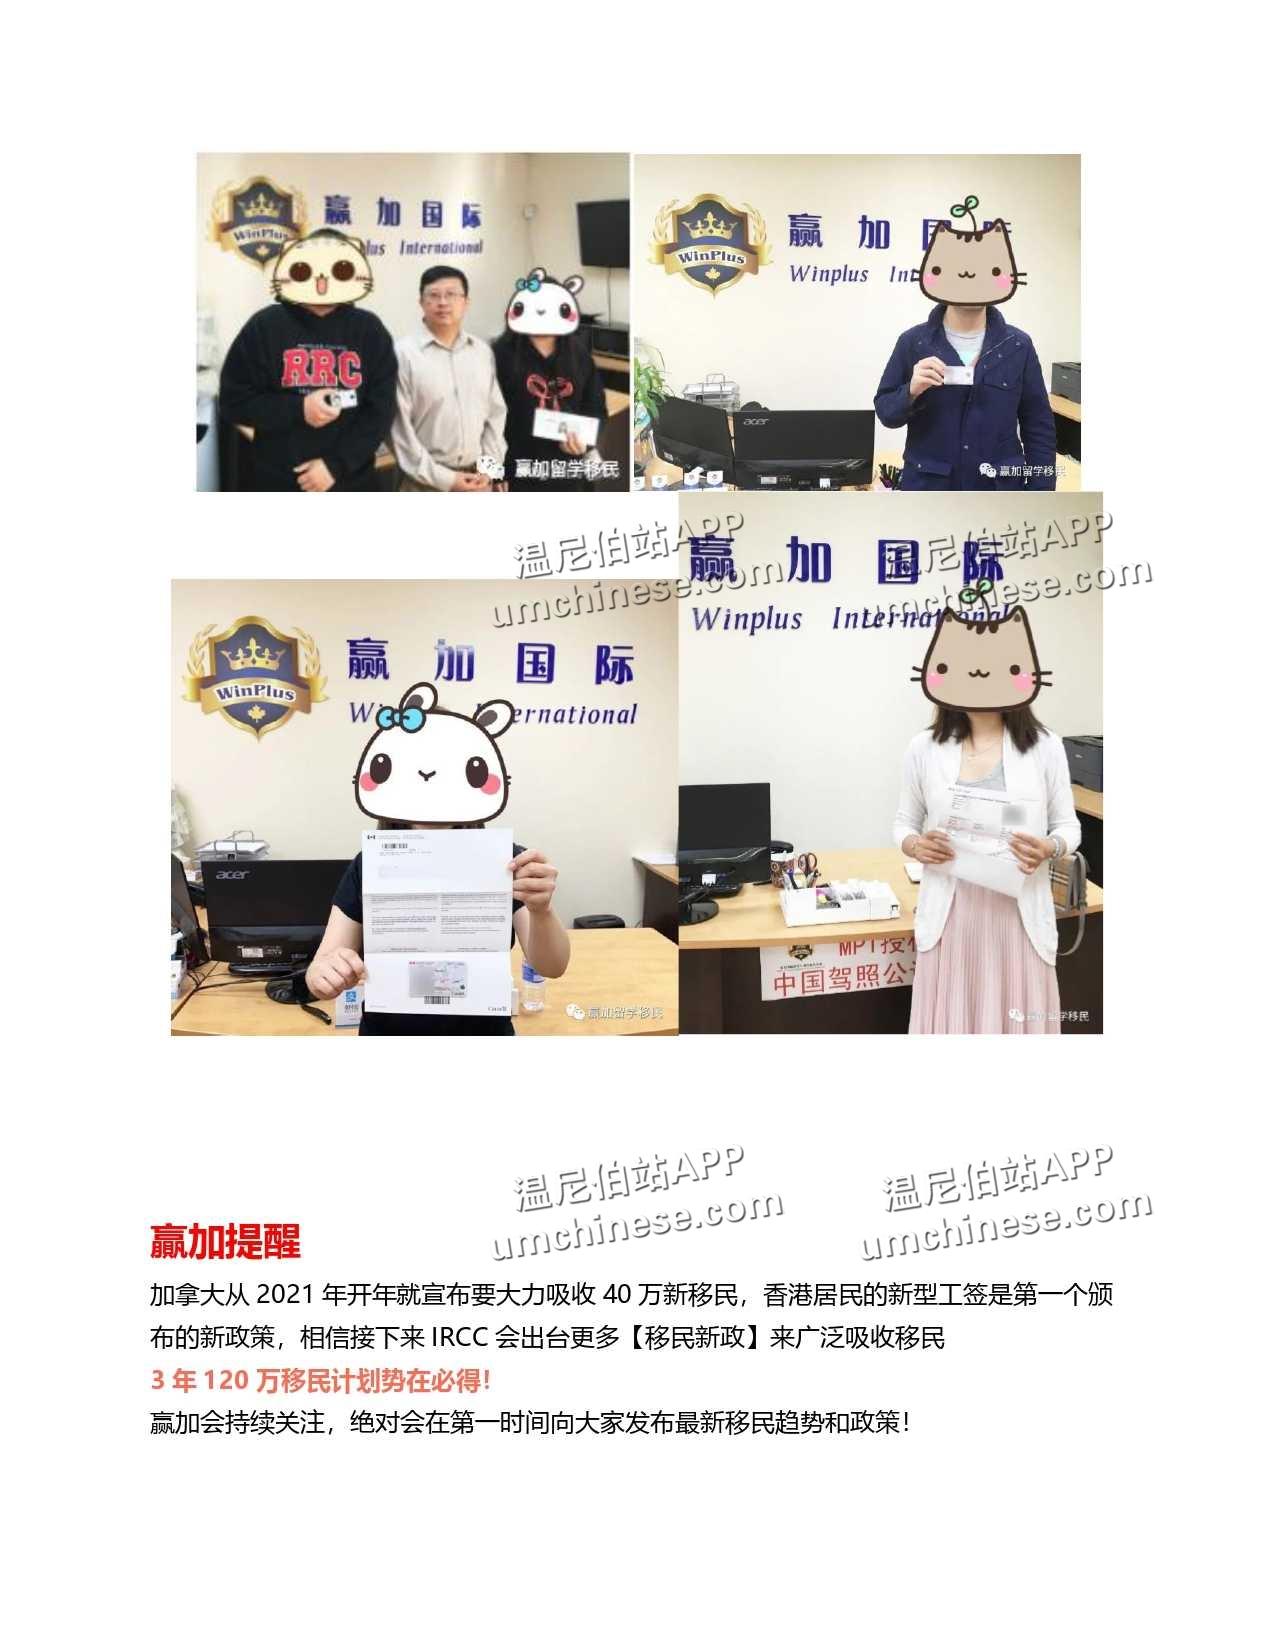 香港政策_page-0010.jpg